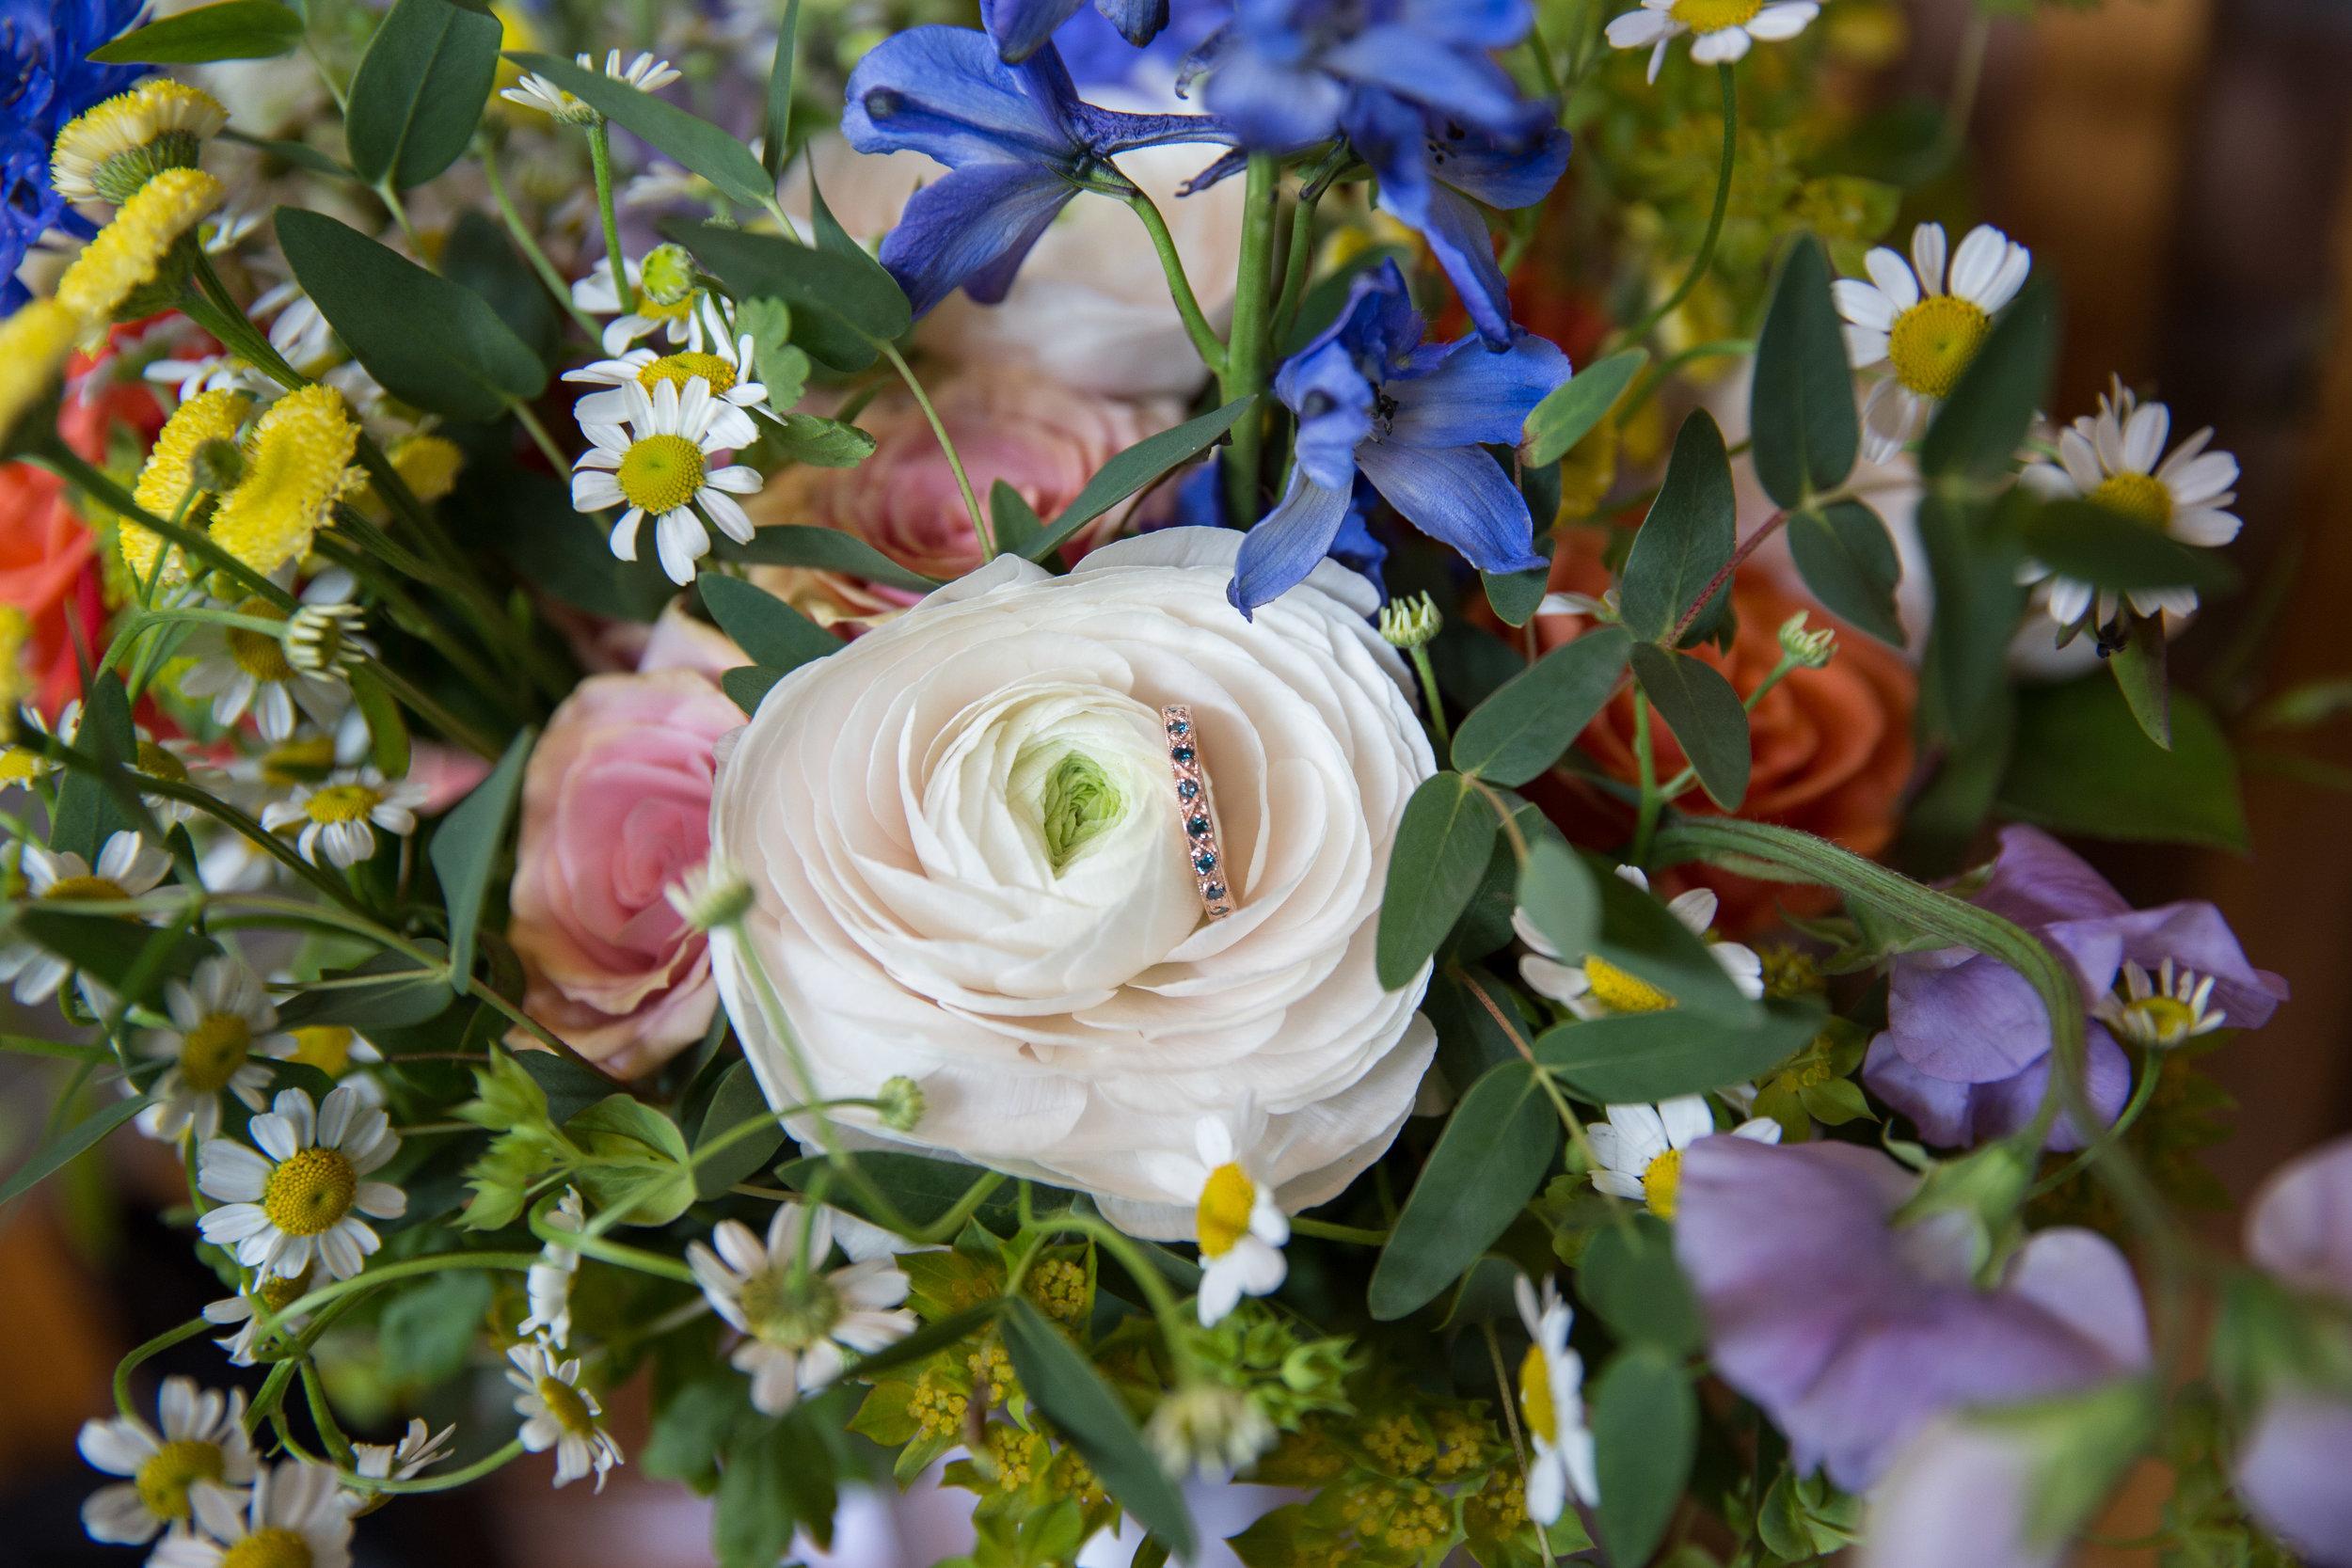 Natalie and Dallas Mooney Wedding 6-8-19_Tania Watt Photography-40.jpg